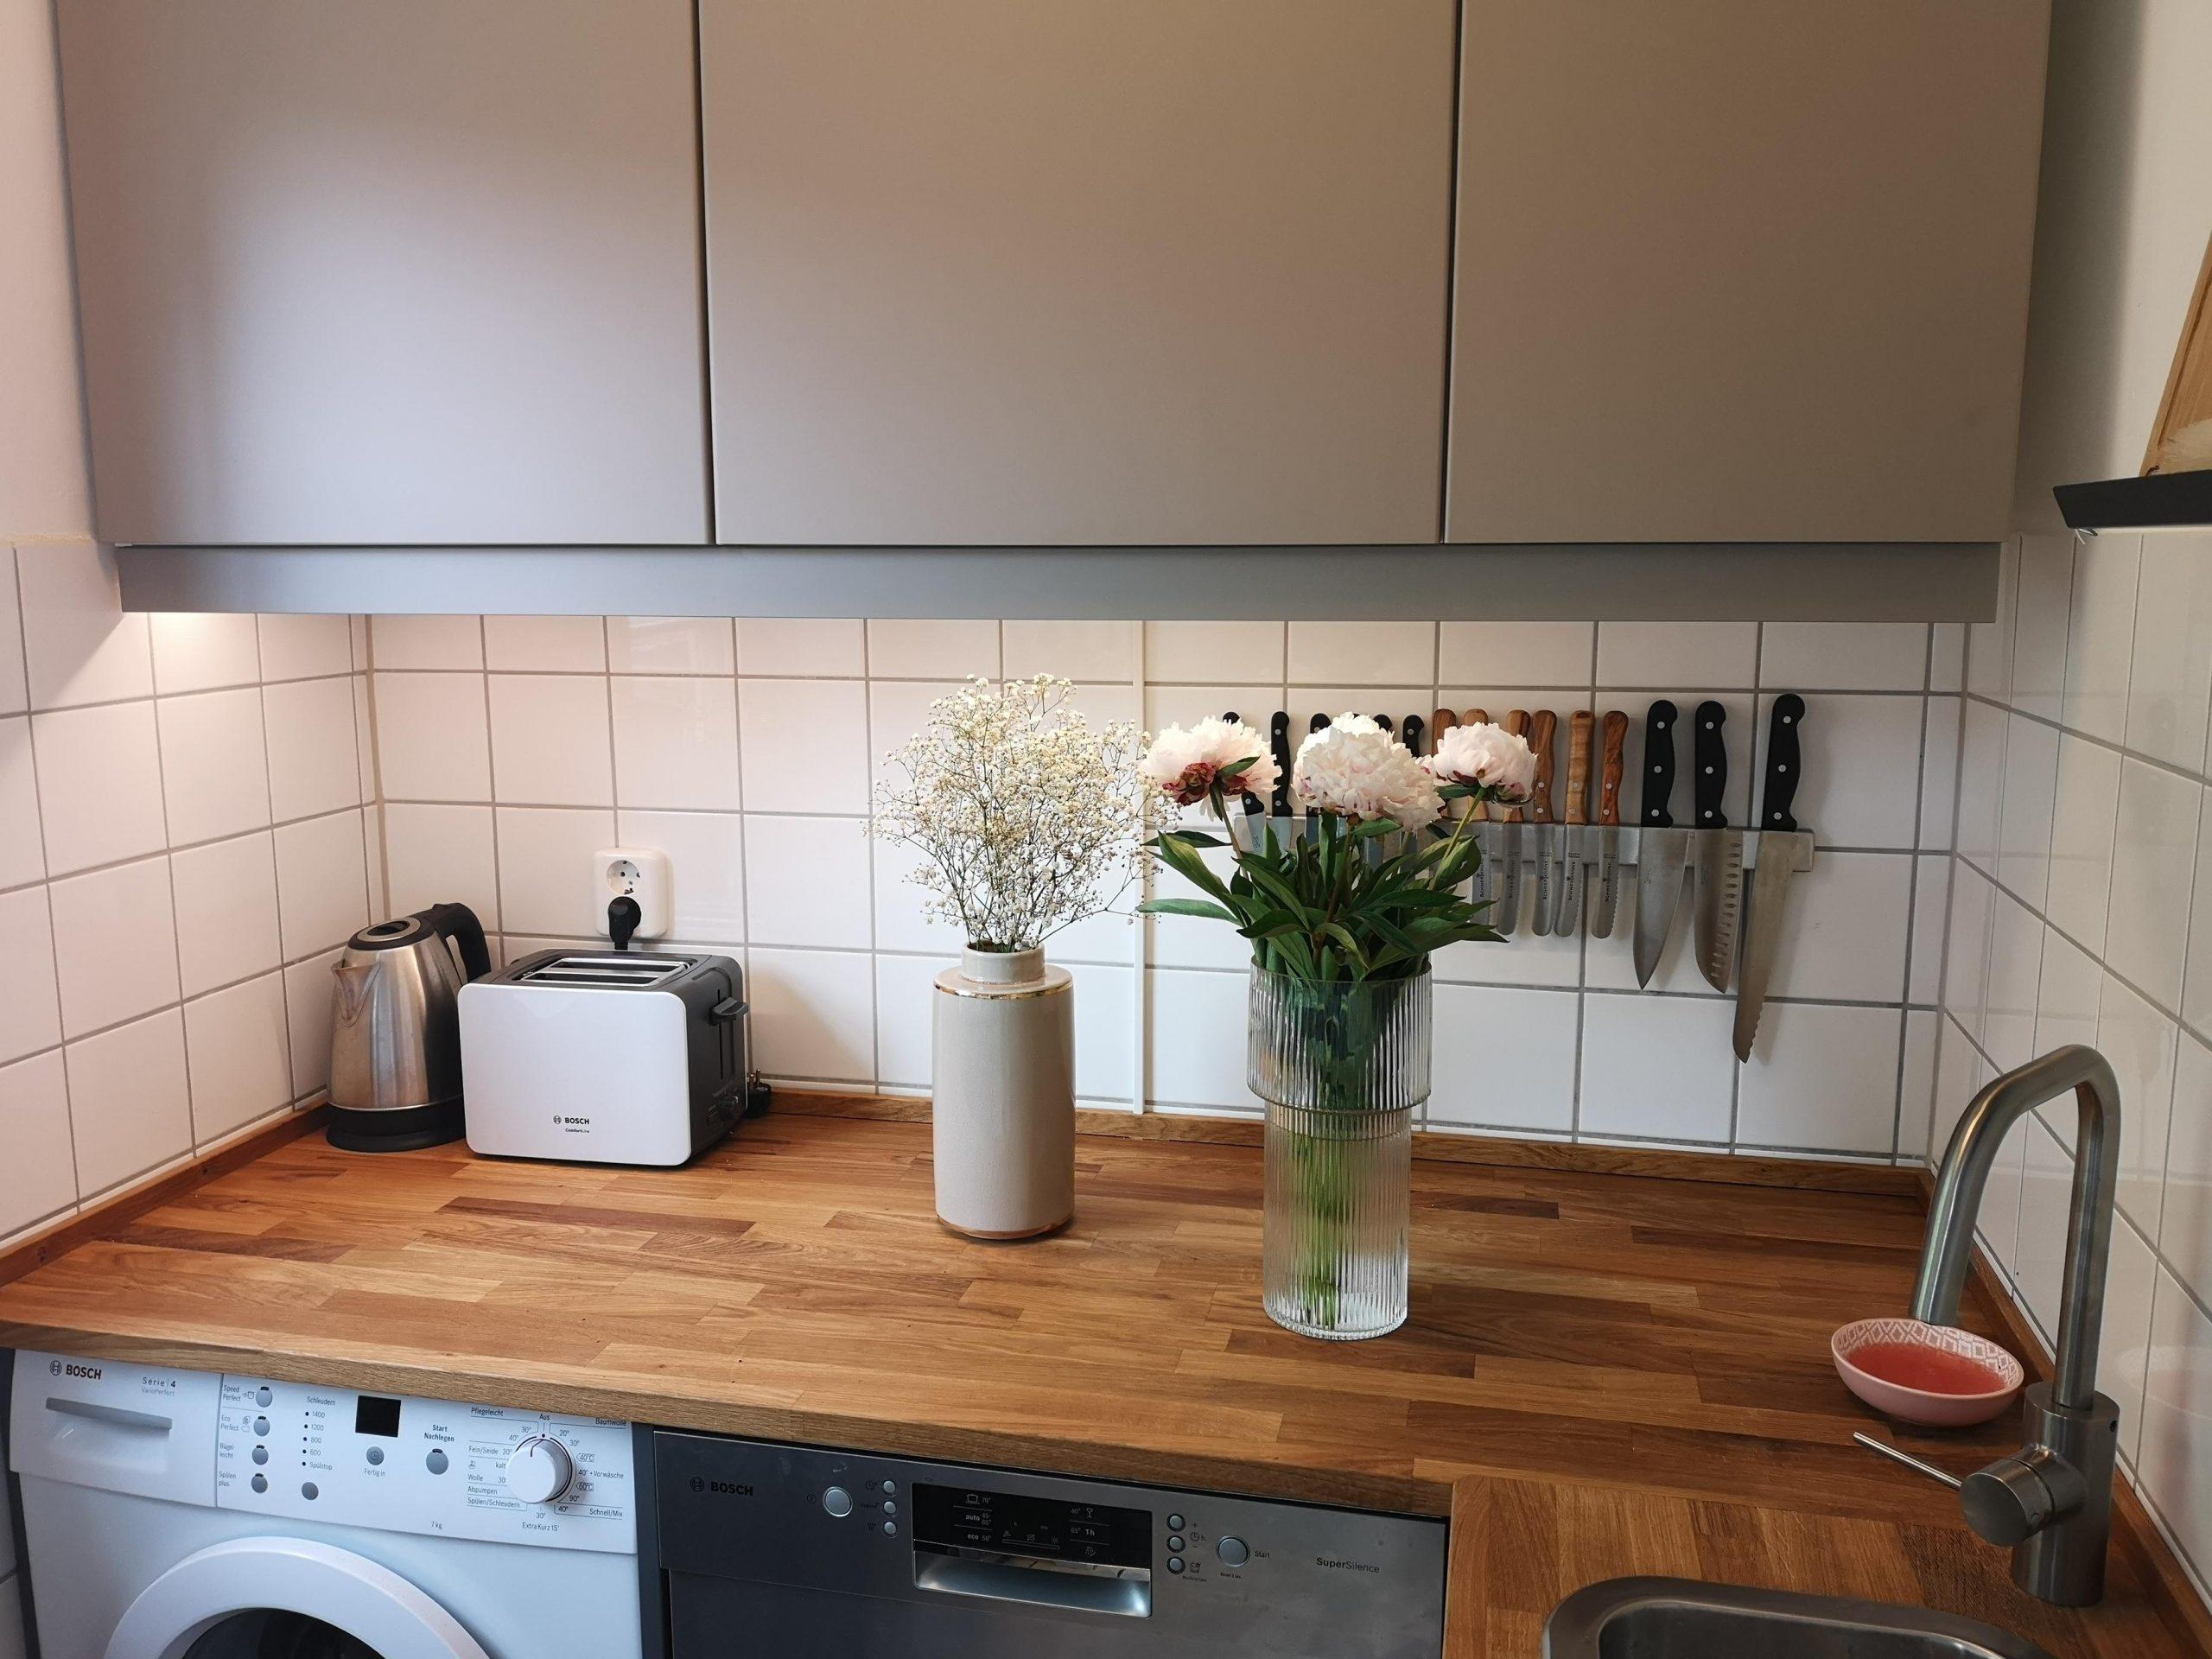 Full Size of Mini Küche Zum Echt Kochen Tefal Mini Küche Aufbauanleitung Mini Küche Mit Geschirrspüler Mini Küche Mit Gasherd Küche Mini Küche